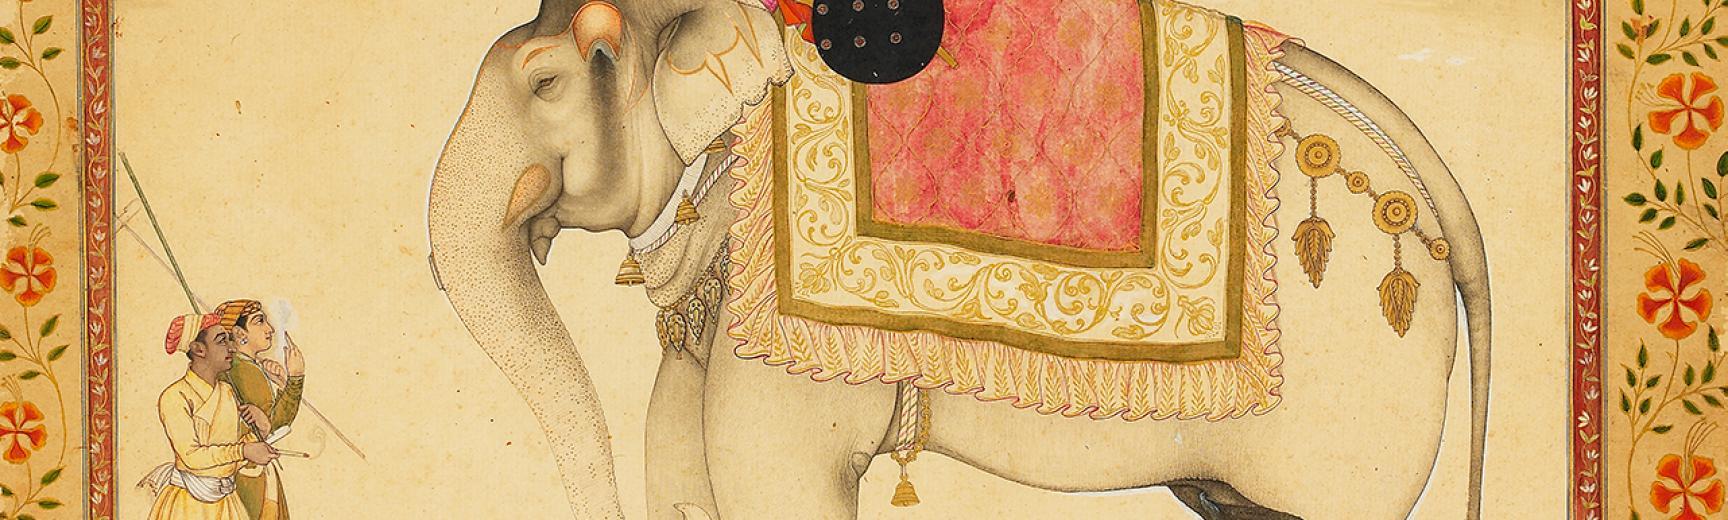 The elephant Ganesh Gaj and rider